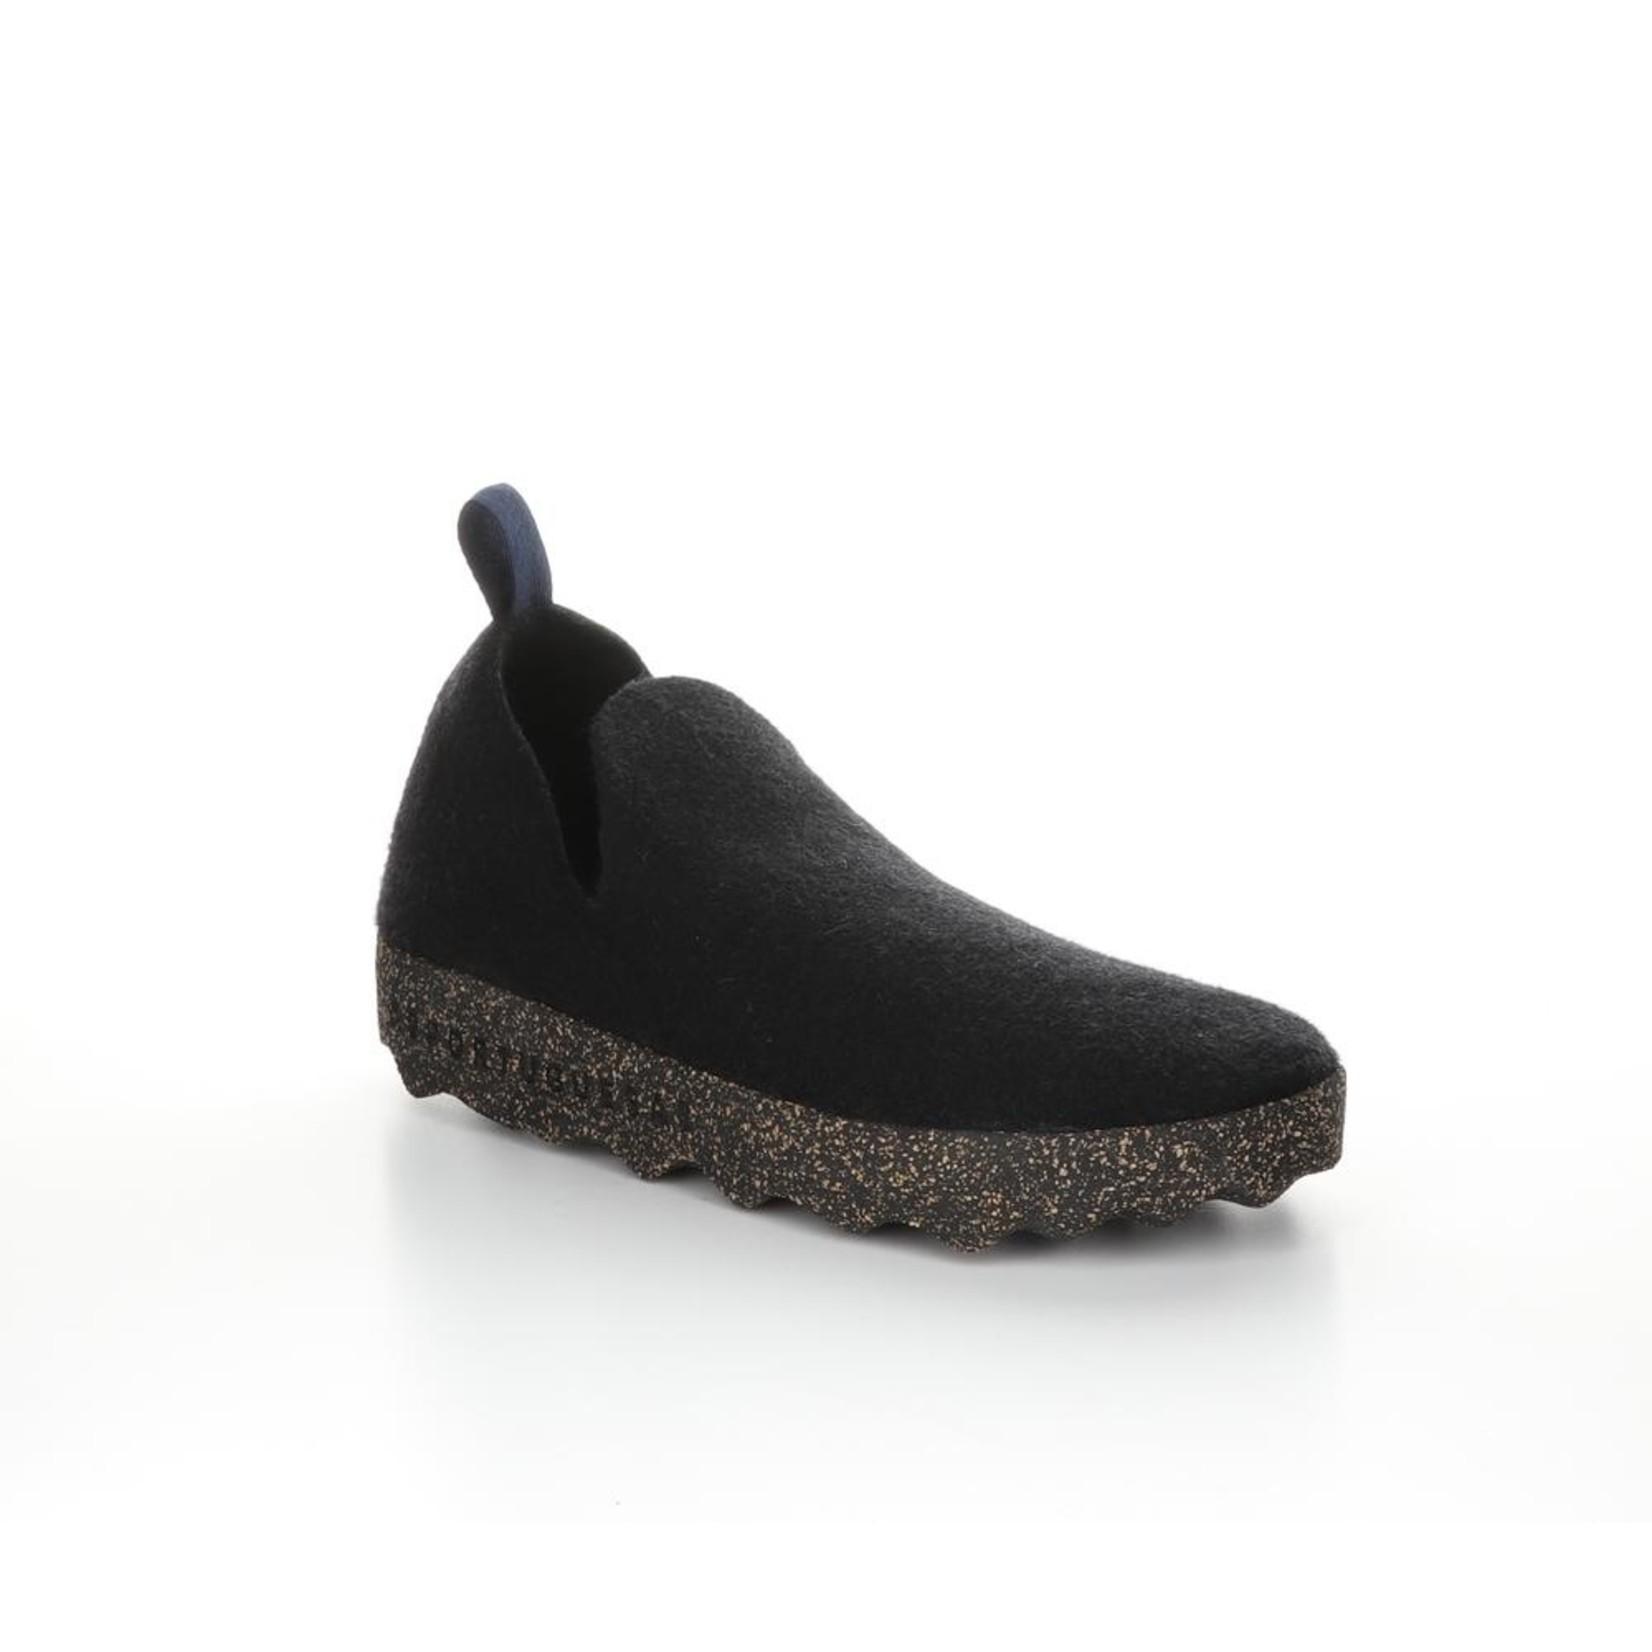 Asportuguesas City Slip-On Shoes